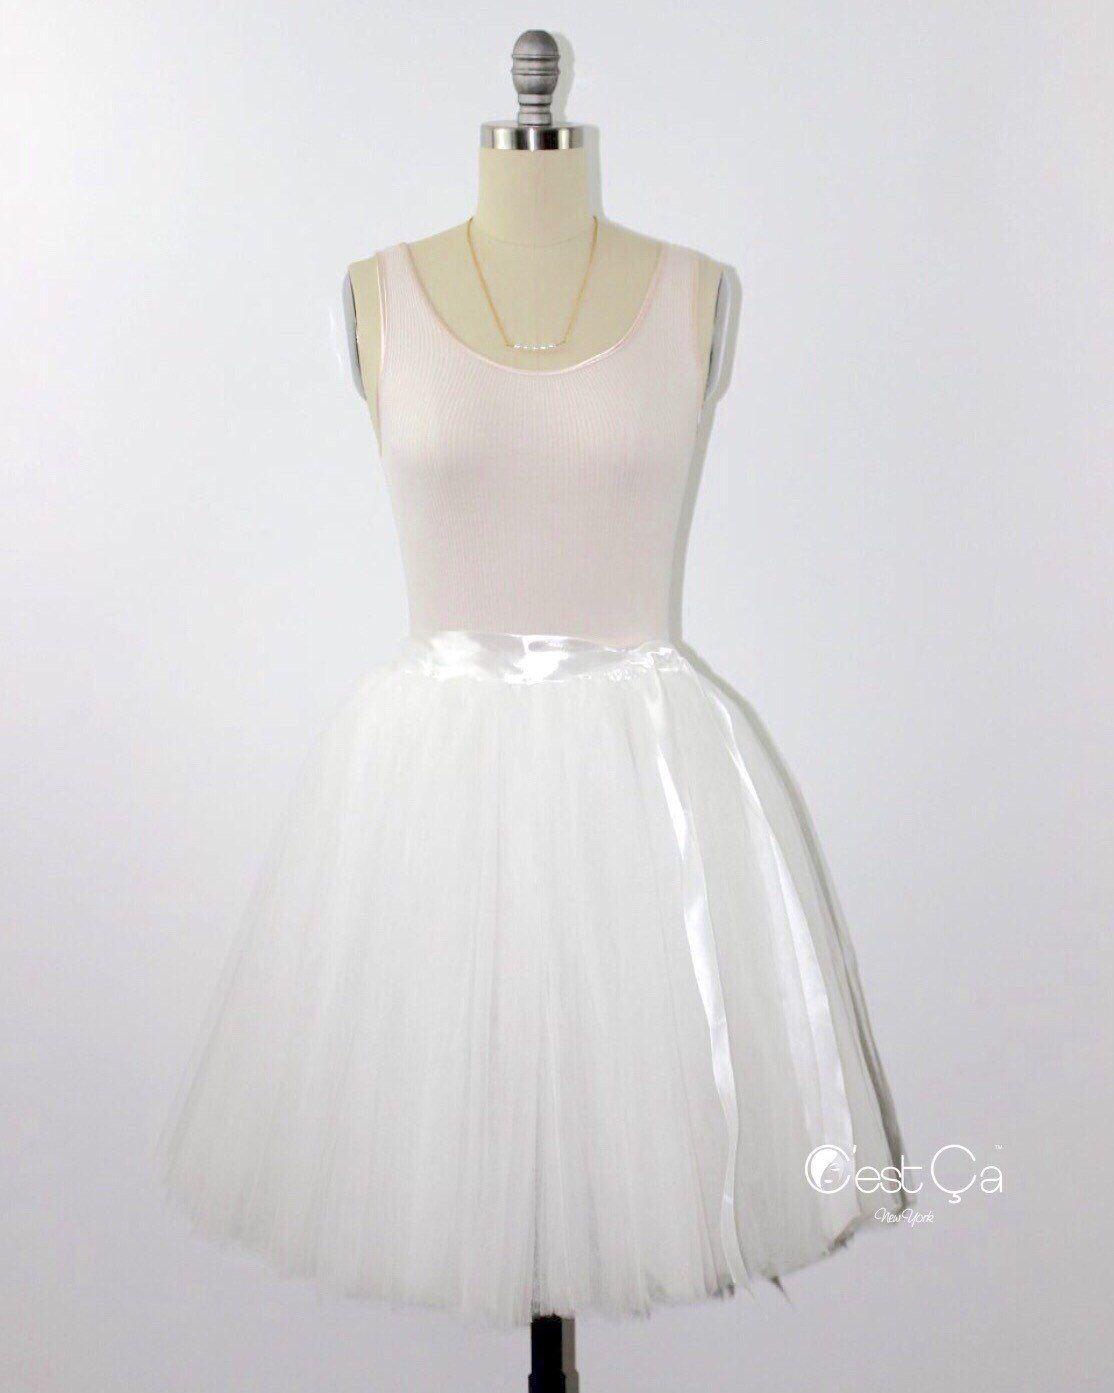 Clarisa Cream White Tulle Skirt Bridesmaids Tulle Skirt Etsy White Tulle Skirt Tulle Skirt Bridesmaid Tulle Skirt [ 1393 x 1114 Pixel ]